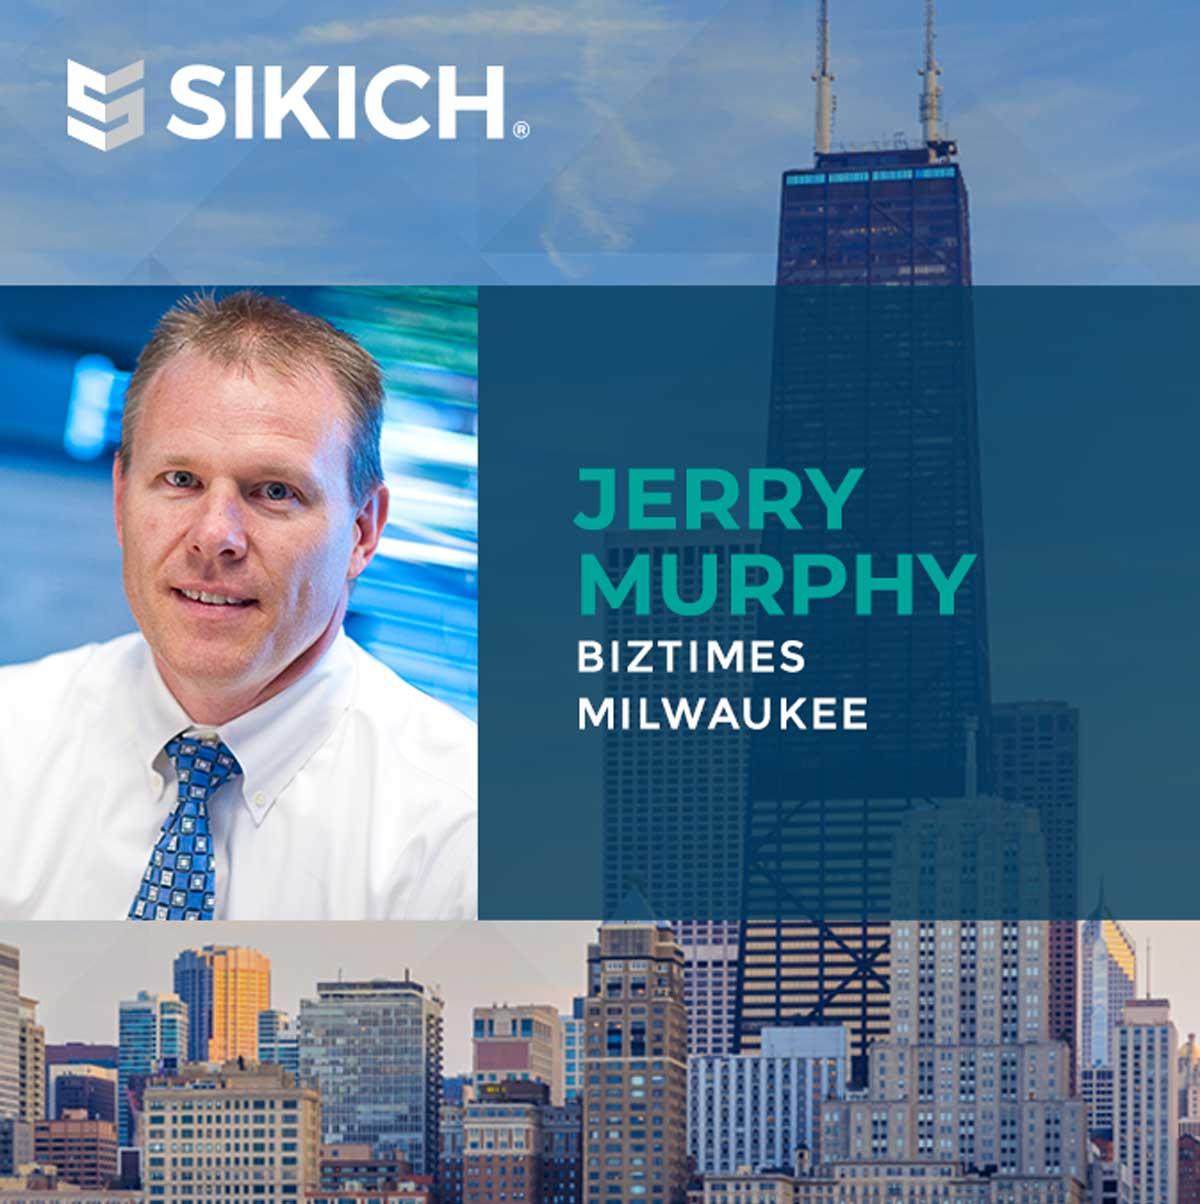 Jerry Murphy Headshot Featured Image